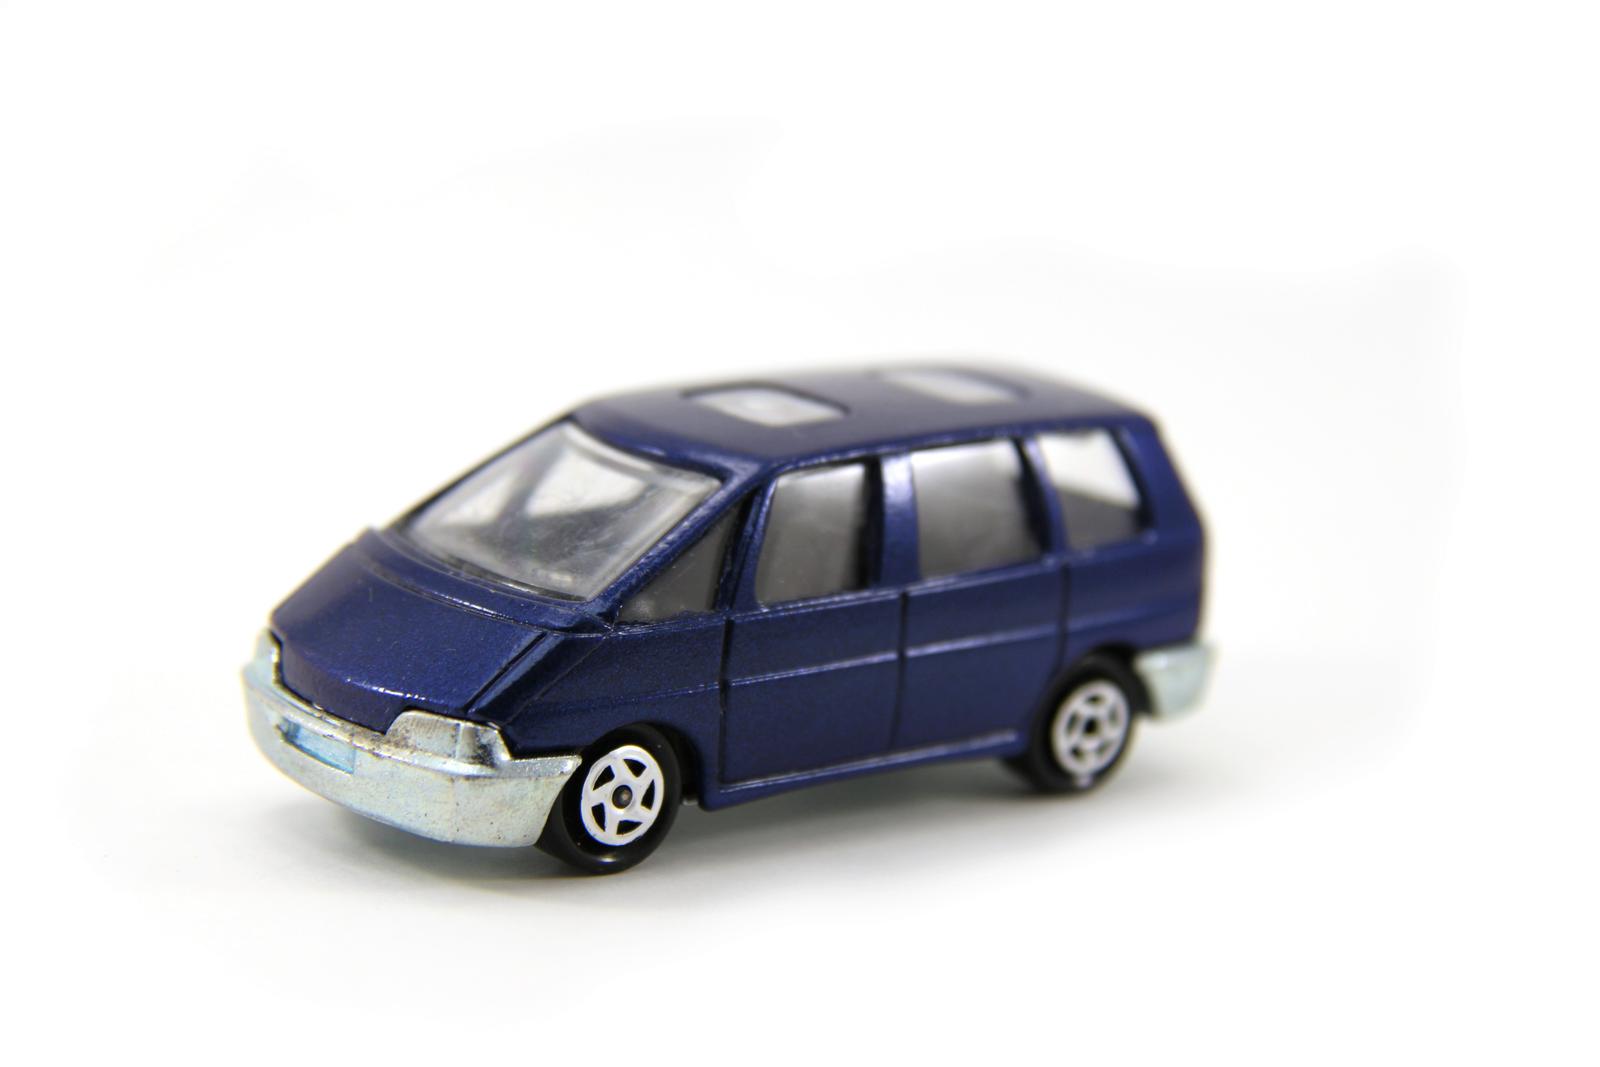 Majorette Renault Espace II (formerly NovaCar casting)